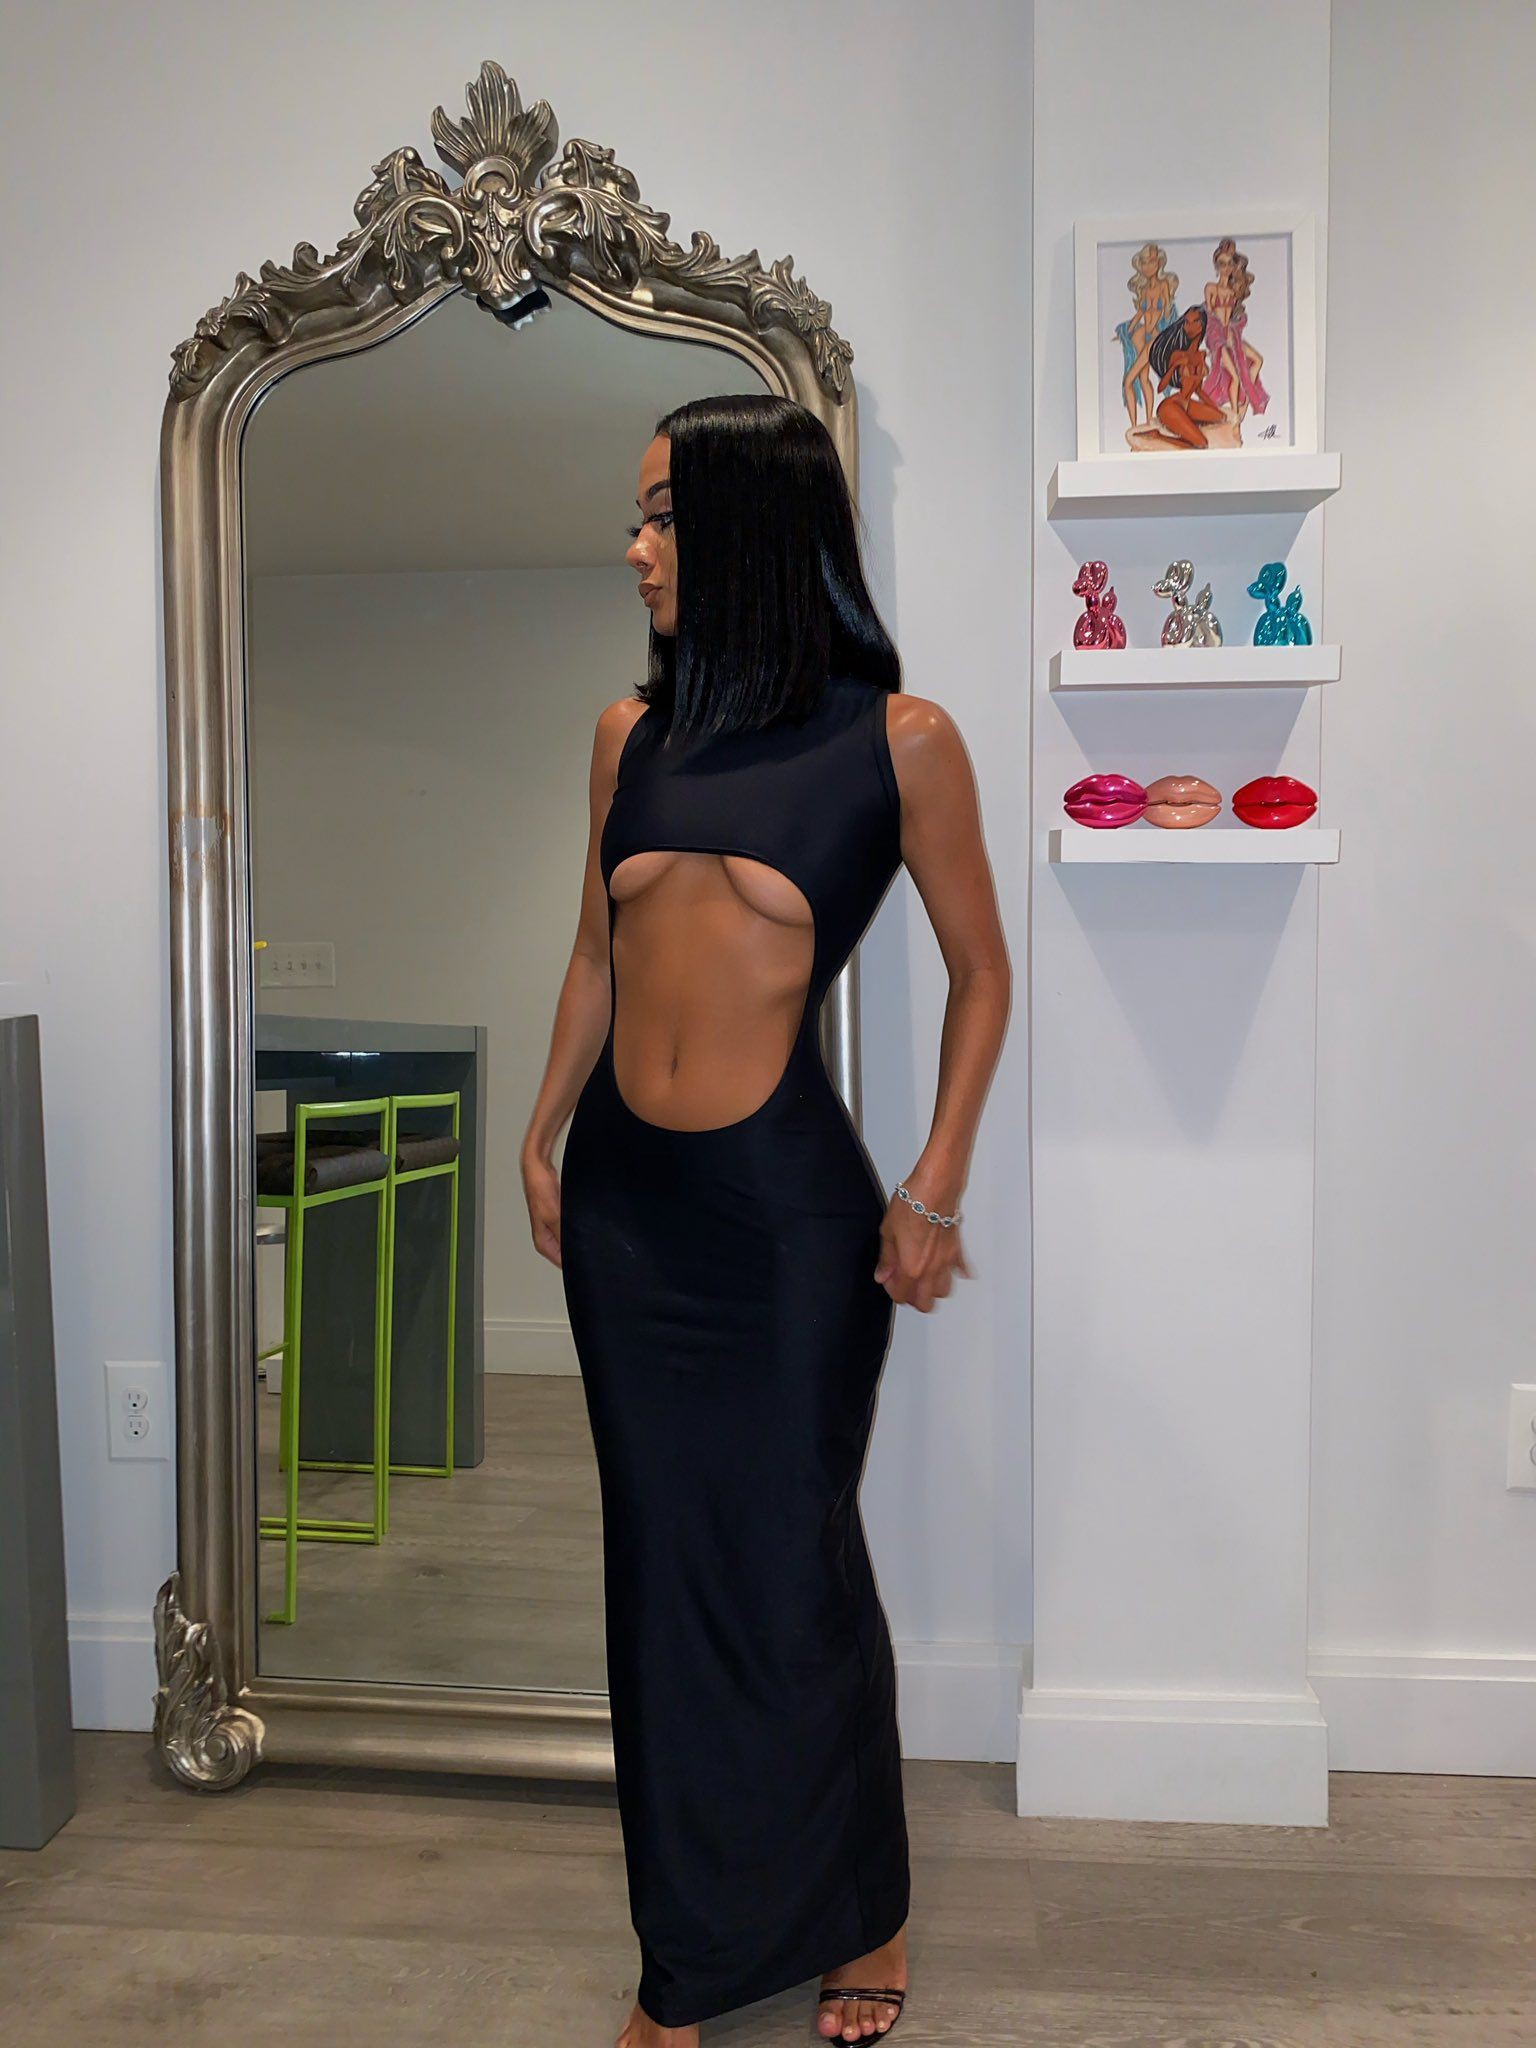 Black vogue ideas with cocktail dress, wedding dress, evening gown